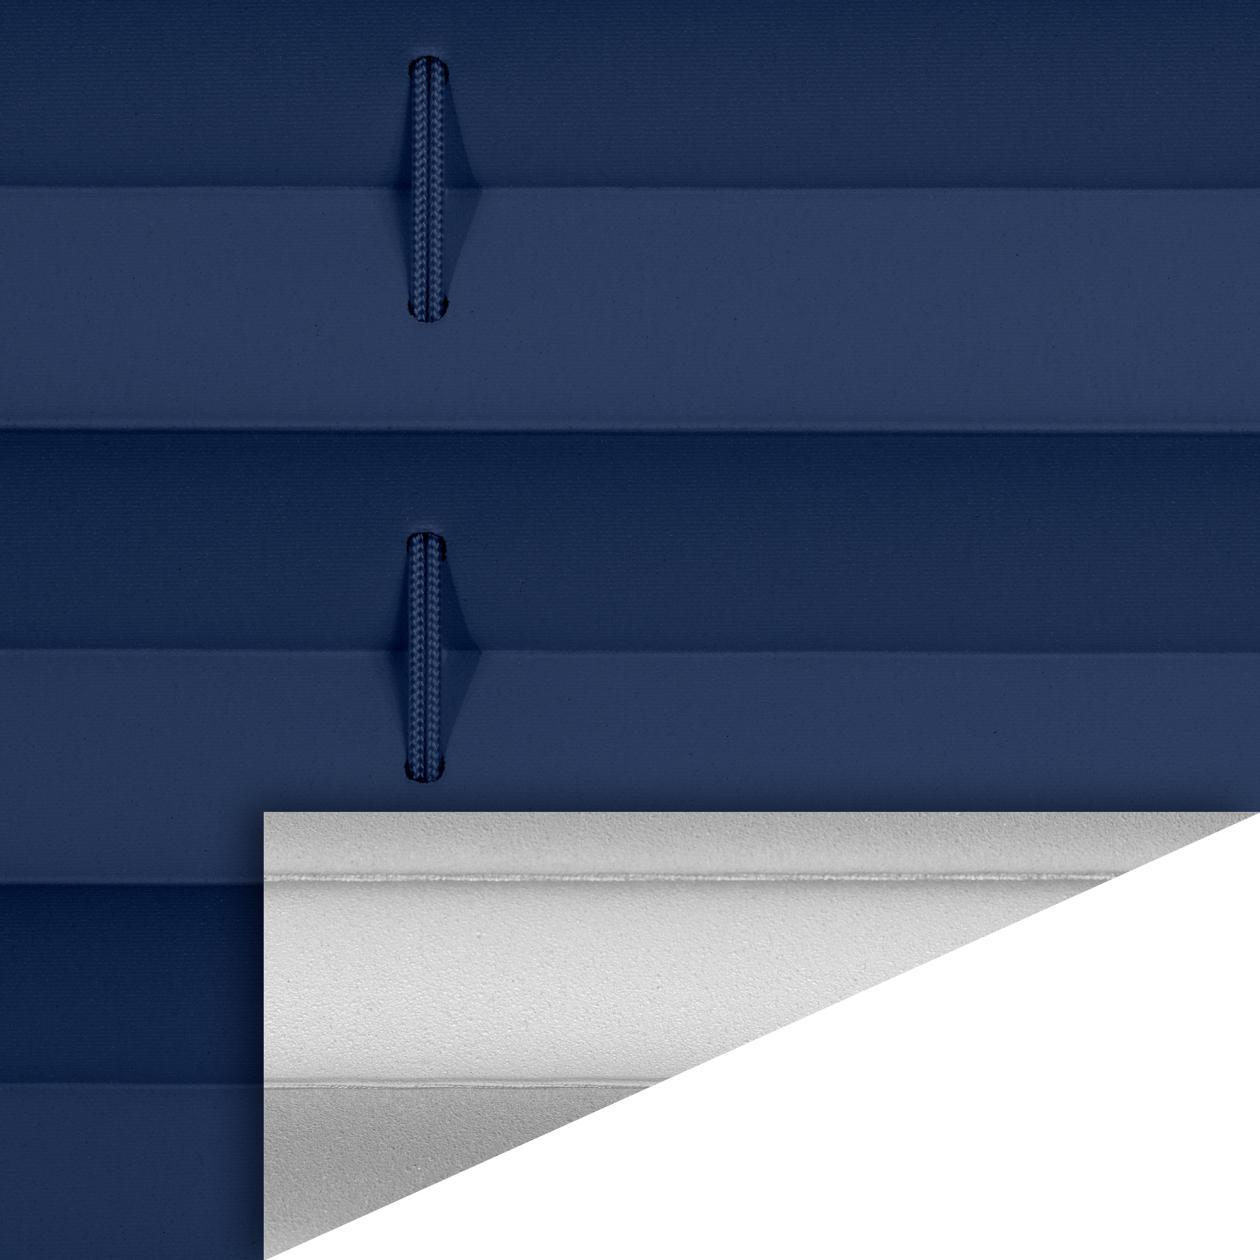 plissee klemmfix thermo ohne bohren verspannt verdunkelung lichblick shop. Black Bedroom Furniture Sets. Home Design Ideas